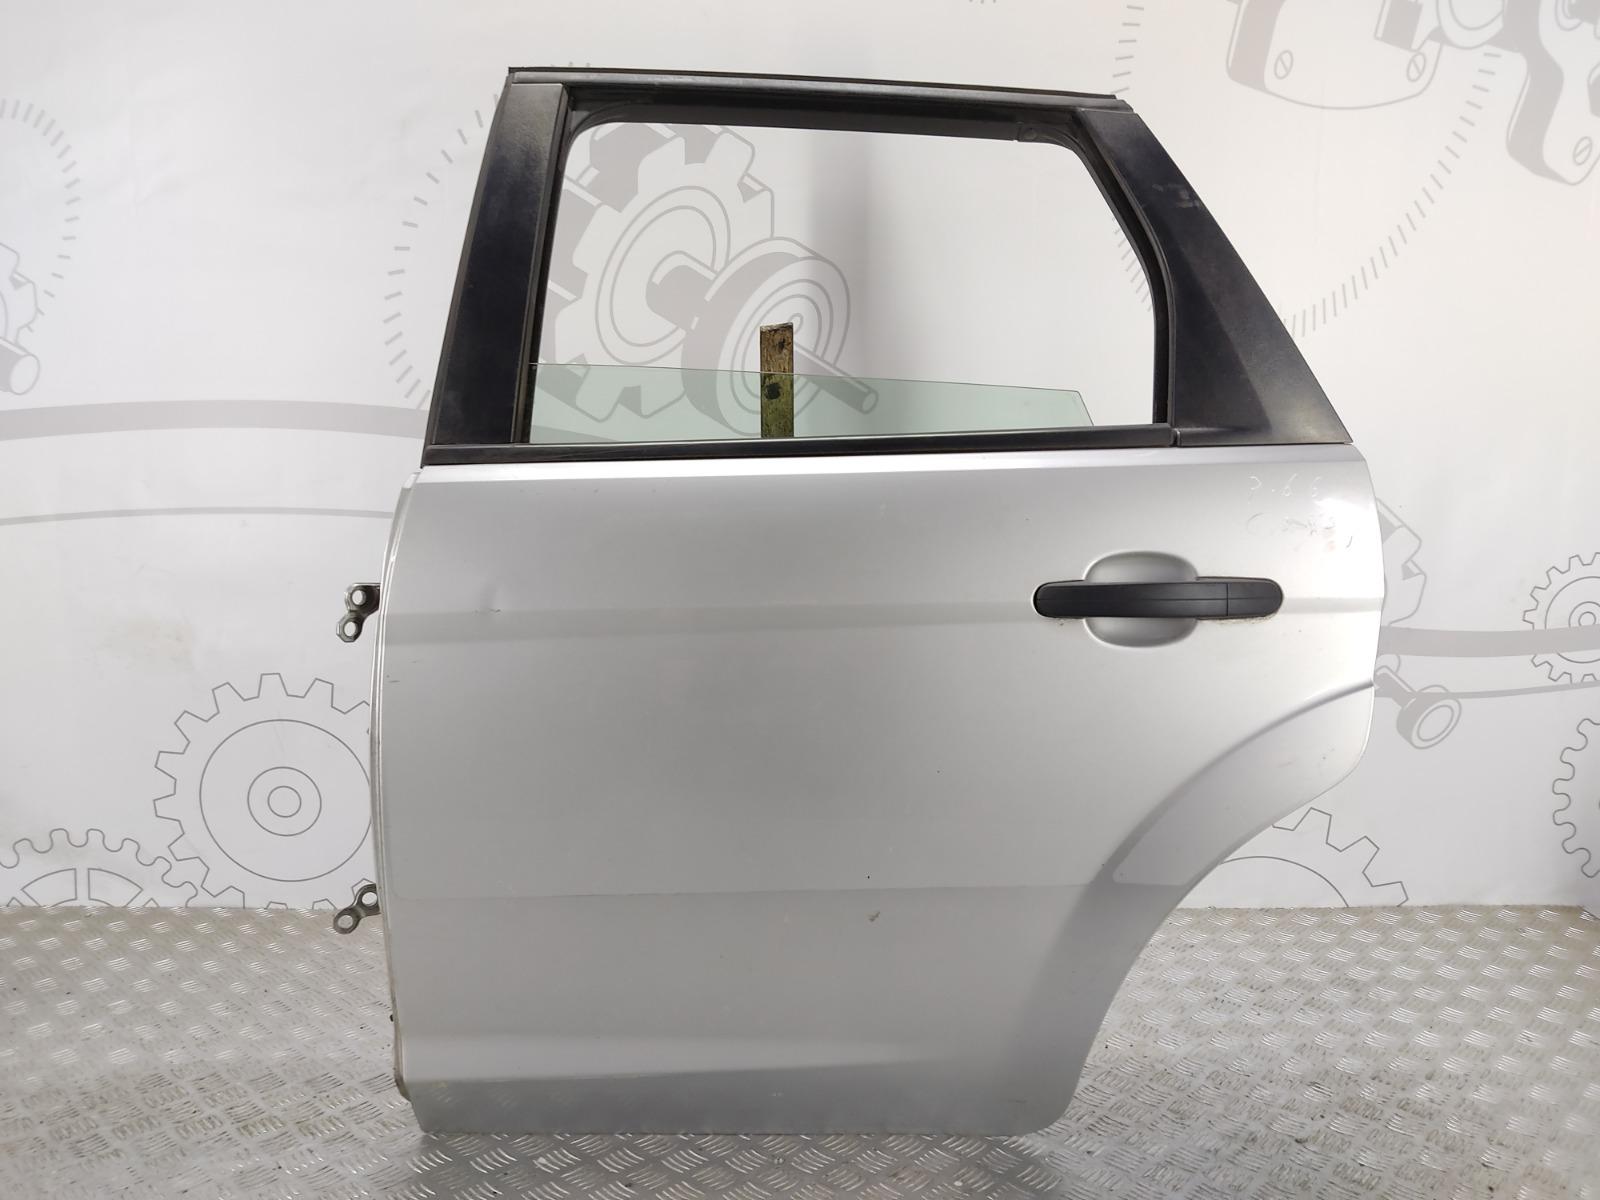 Дверь задняя левая Ford Focus 1.6 TDCI 2007 (б/у)